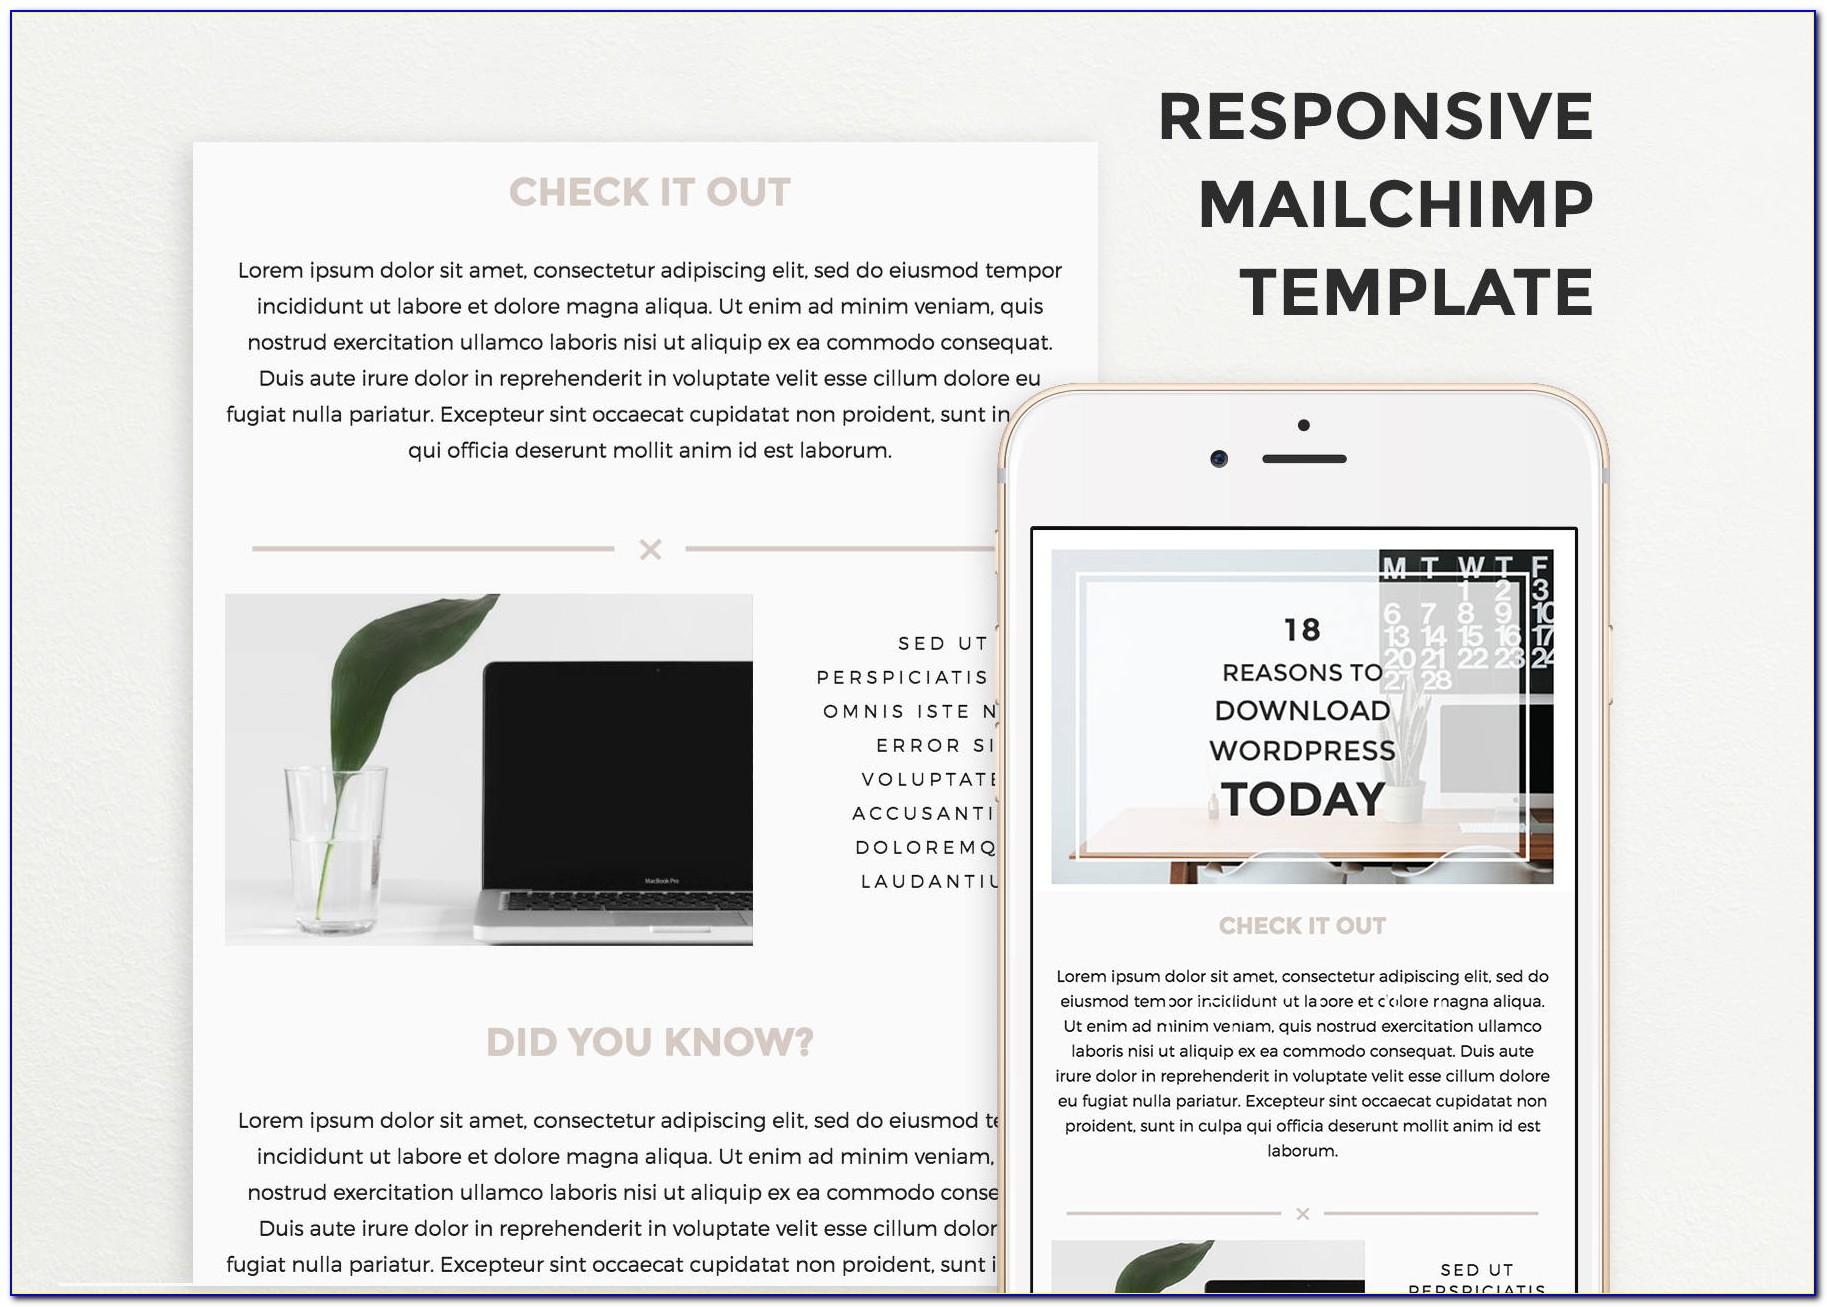 Mailchimp Template Responsive